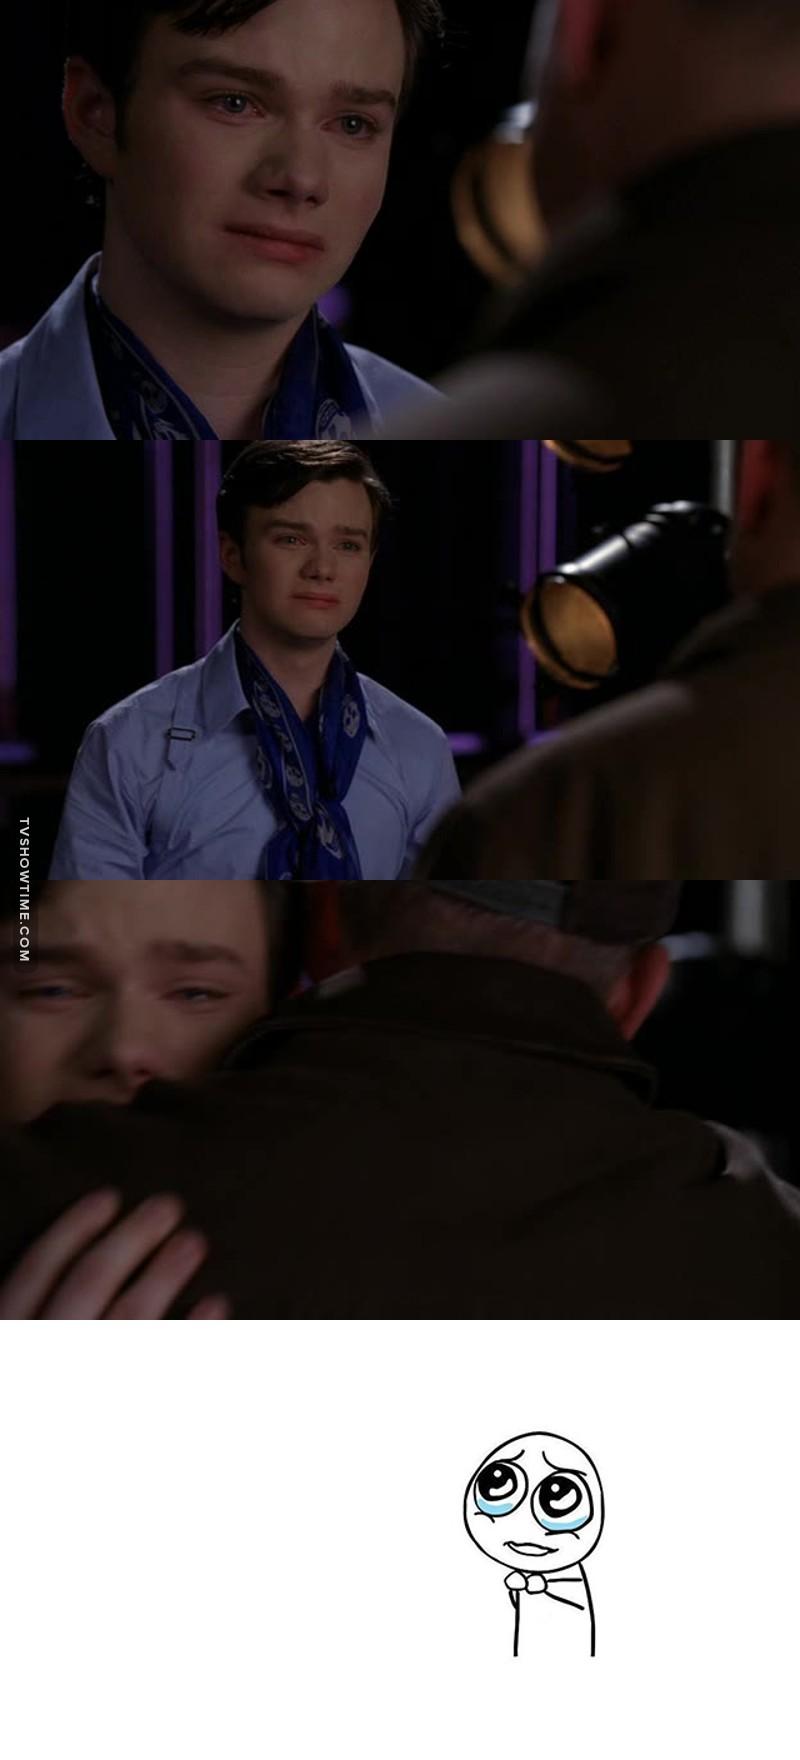 When Kurt cryng.